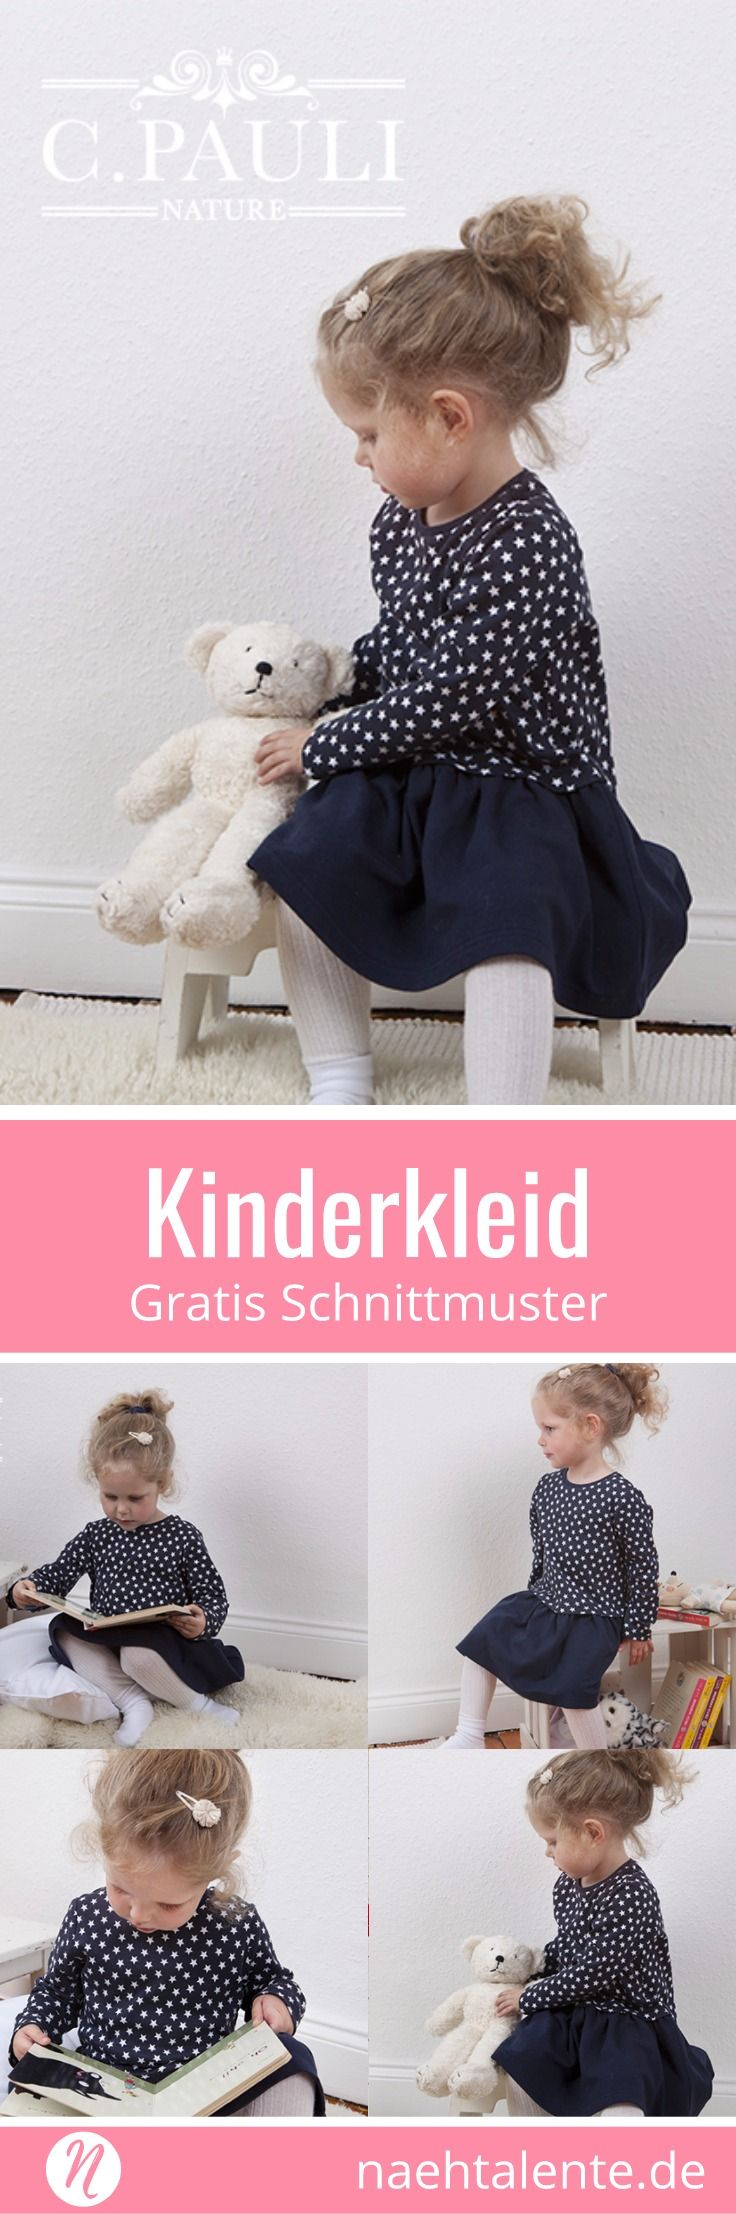 Kinderkleid mit Kräuselrock - Freebook | Pinterest | Magazin ...